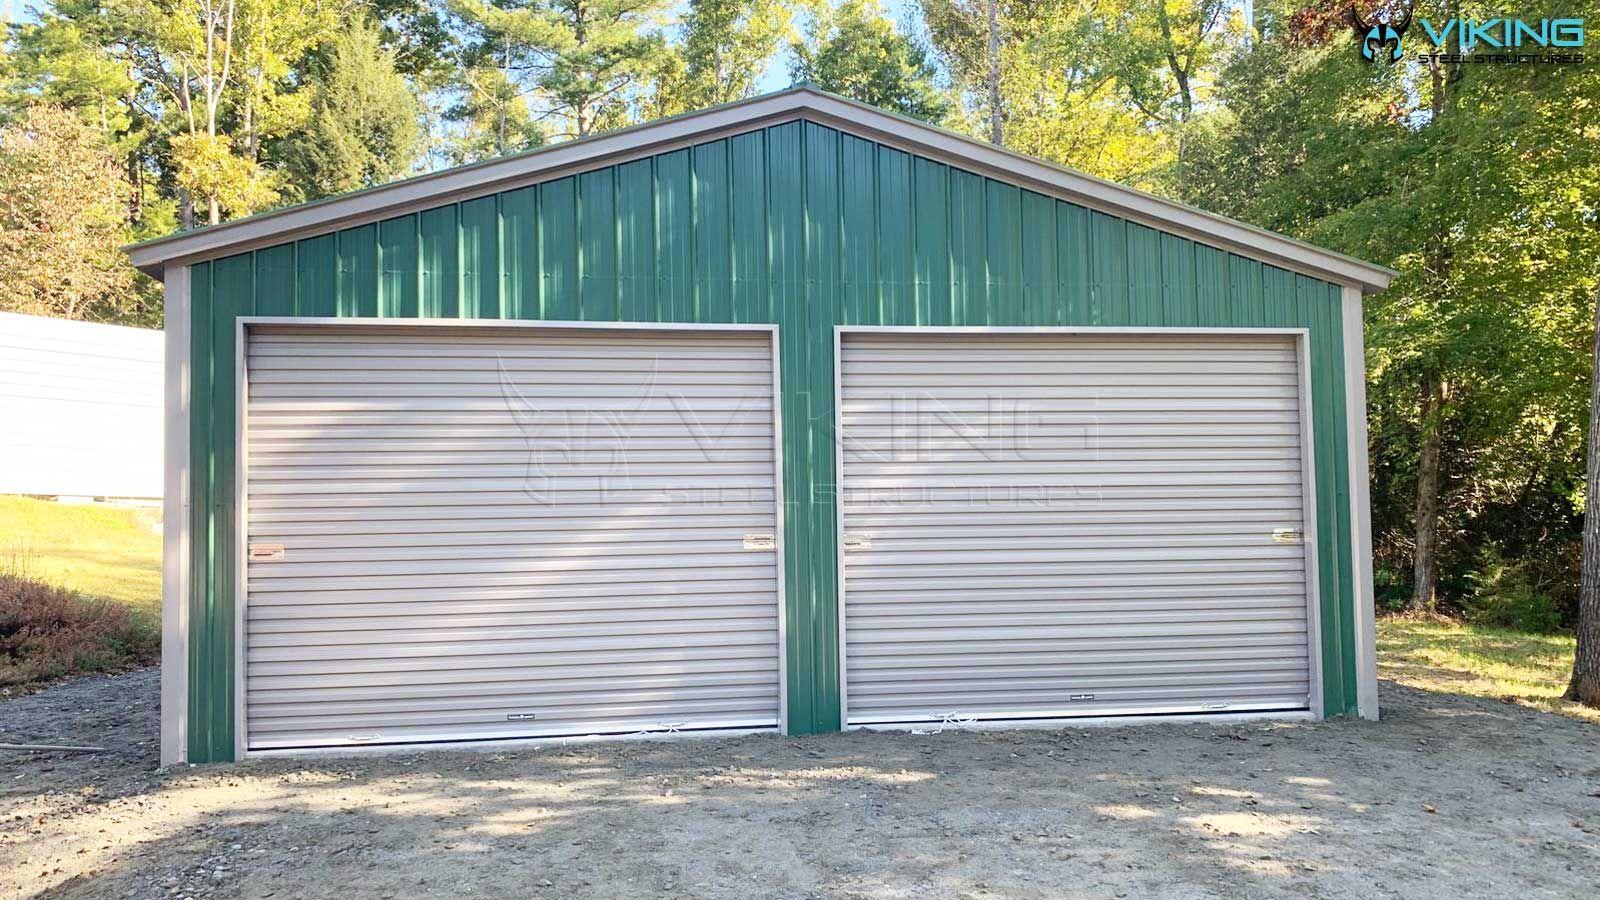 24'Wx40'Lx9'H All Vertical Metal Garage Metal garages